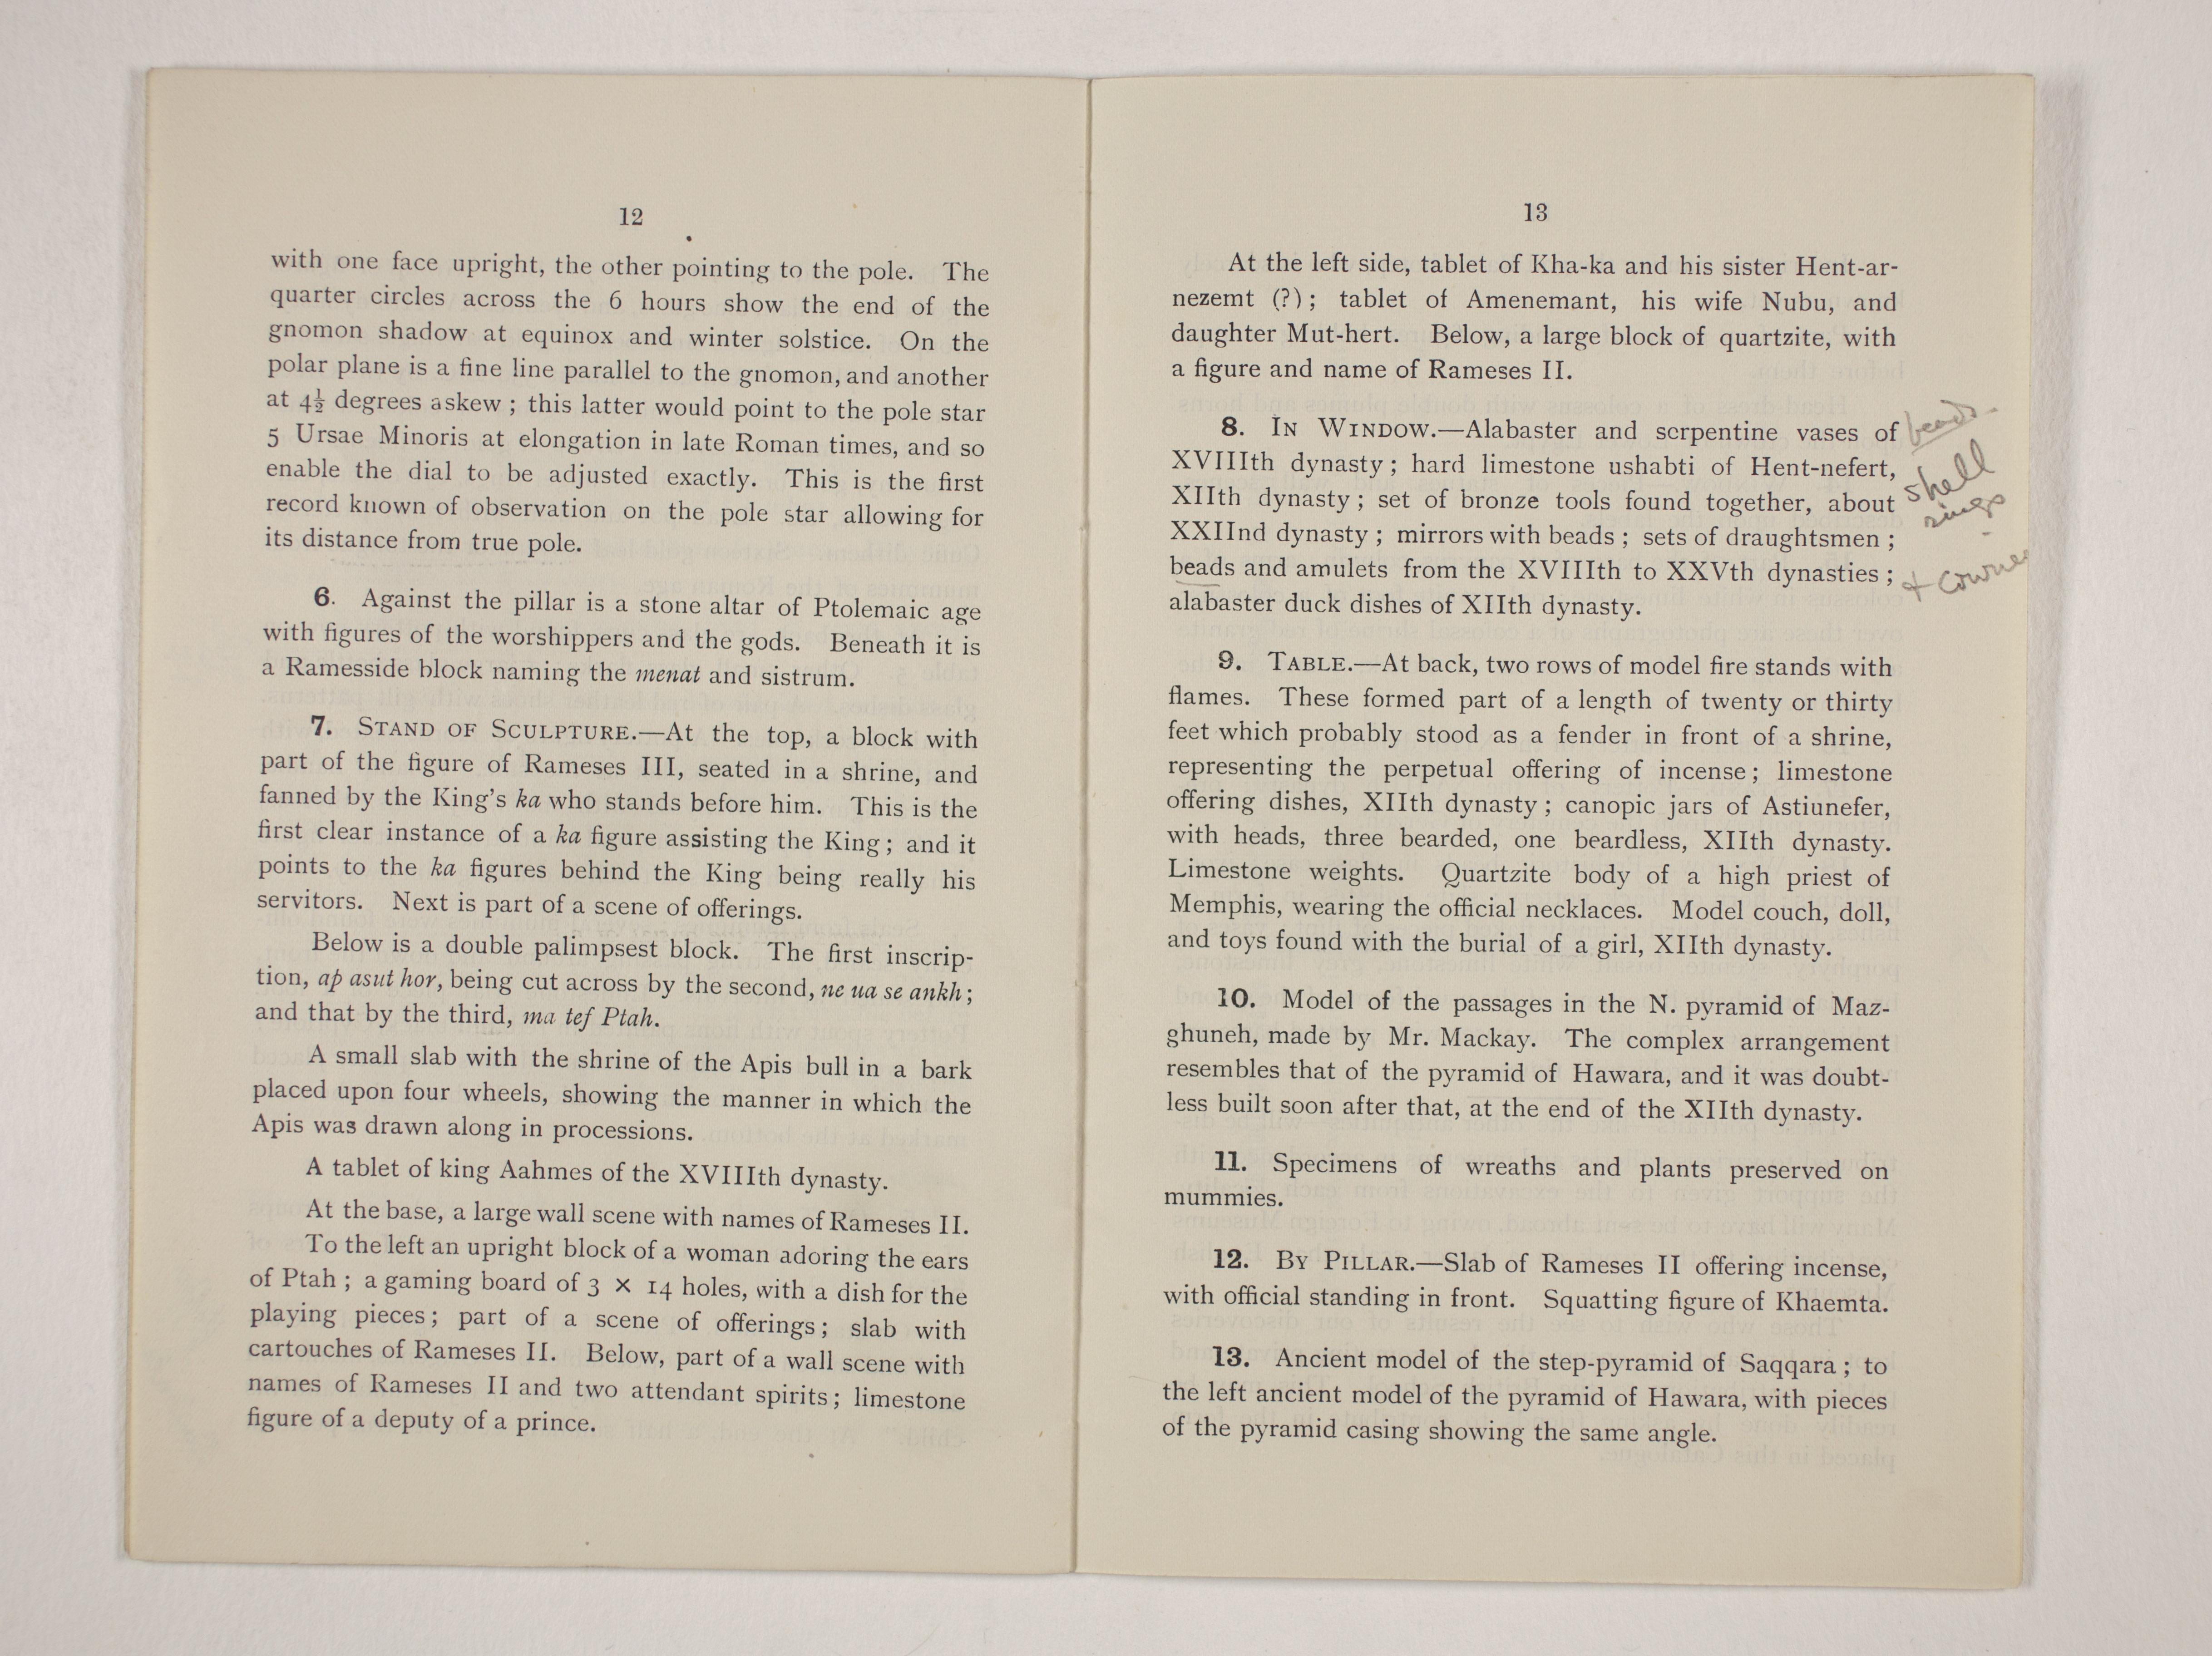 1910-11 Hawara, Gerzeh, Memphis, Mazghuneh Exhibition catalogue PMA/WFP1/D/19/35.8